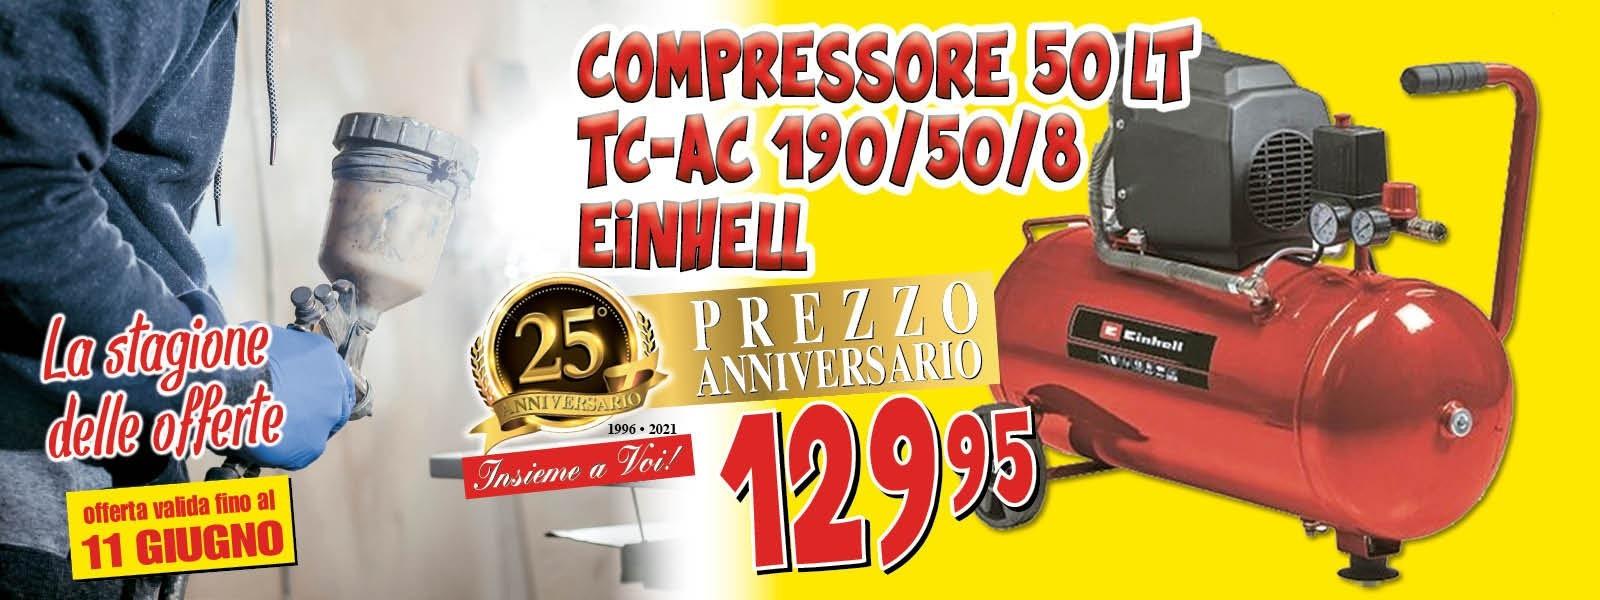 compressore 50lt